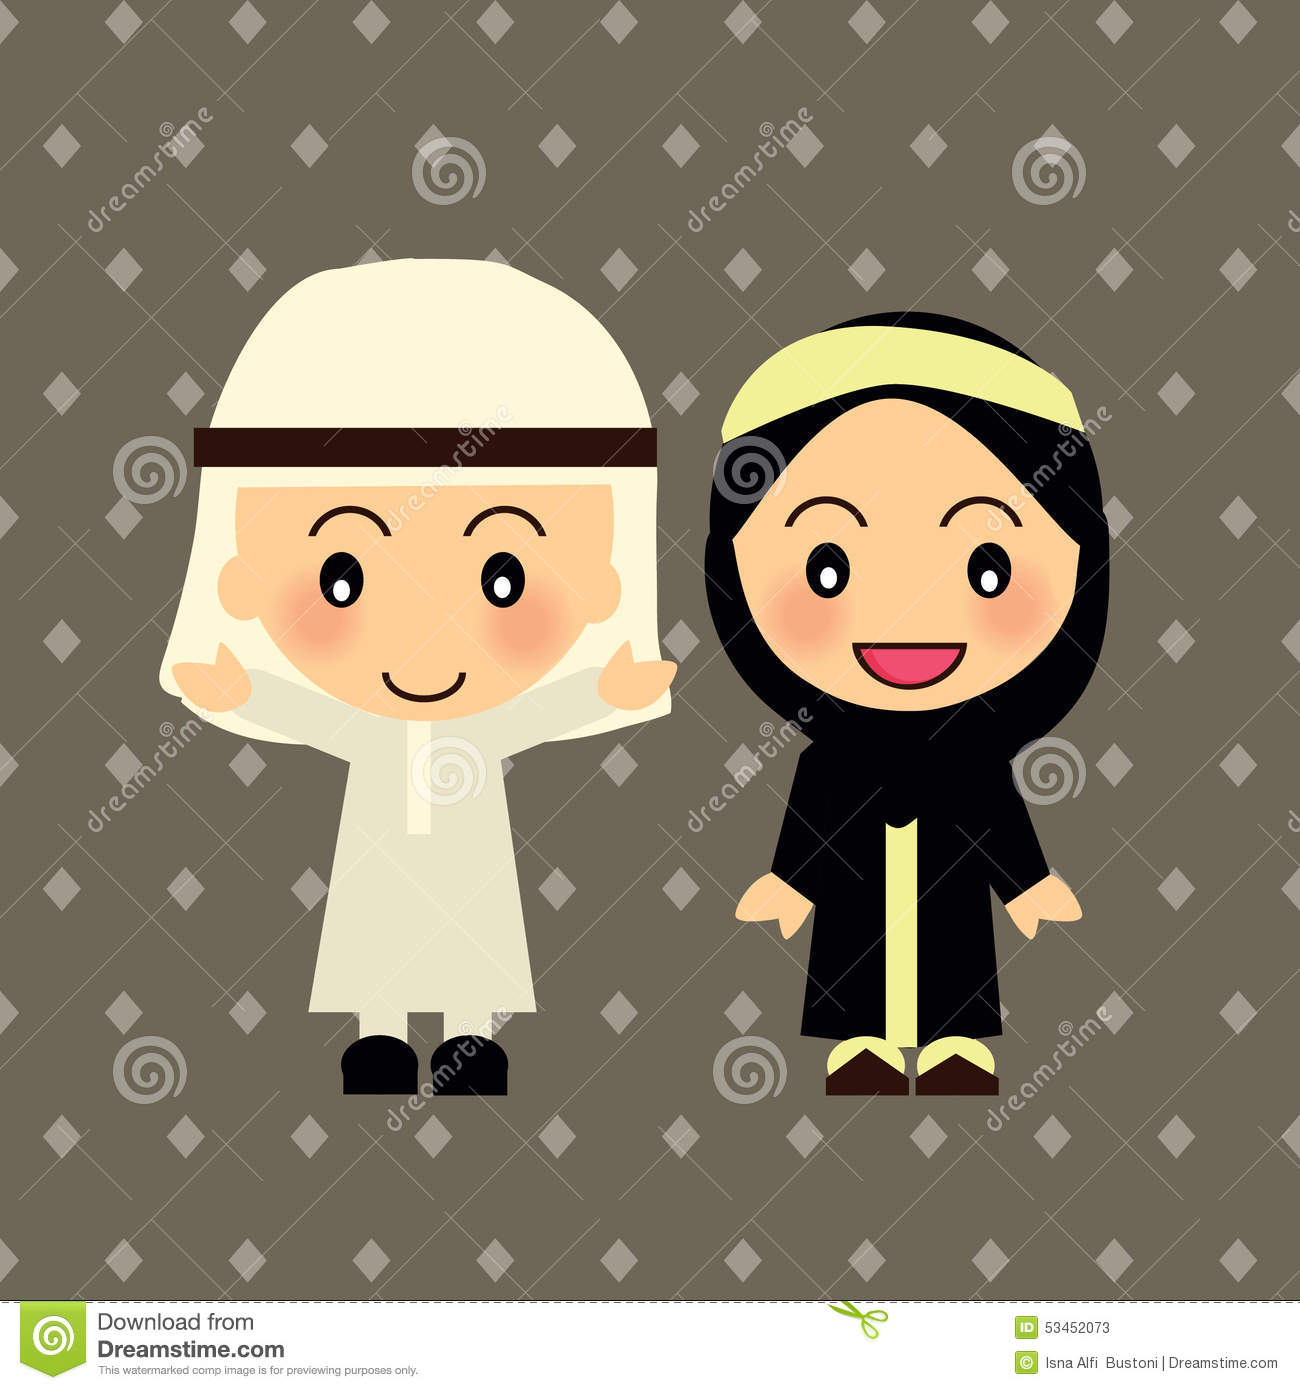 Arabic clipart kids. Clipartfest world from arab